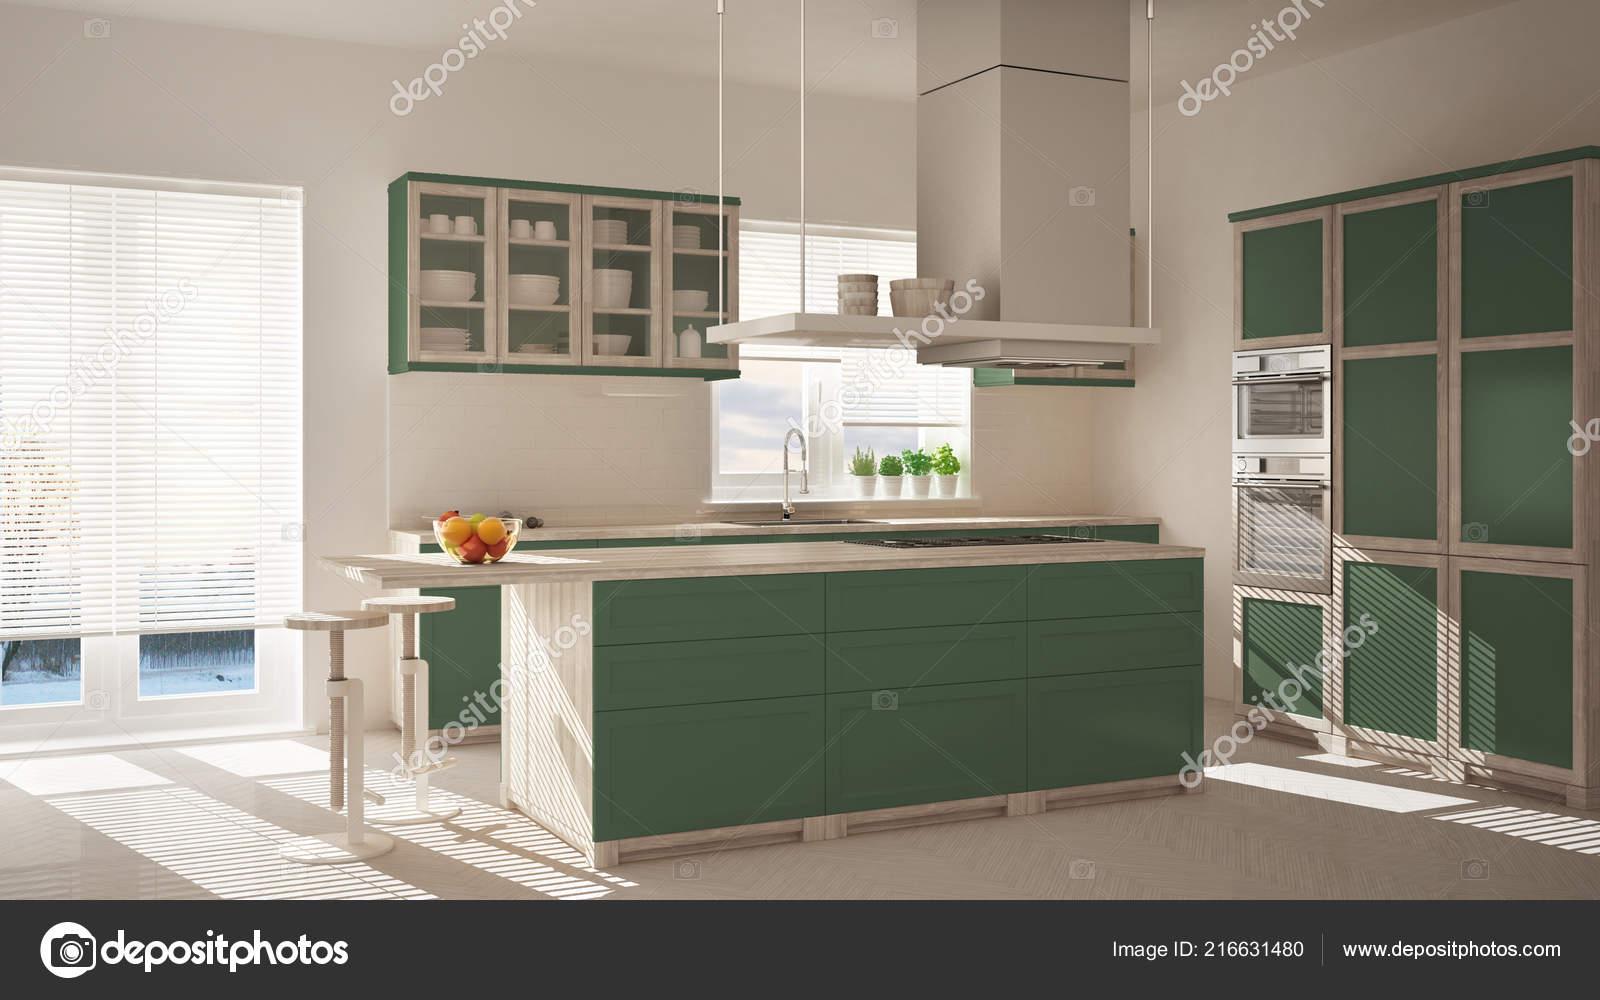 Cucina moderna legno verde isola sgabelli finestre pavimento